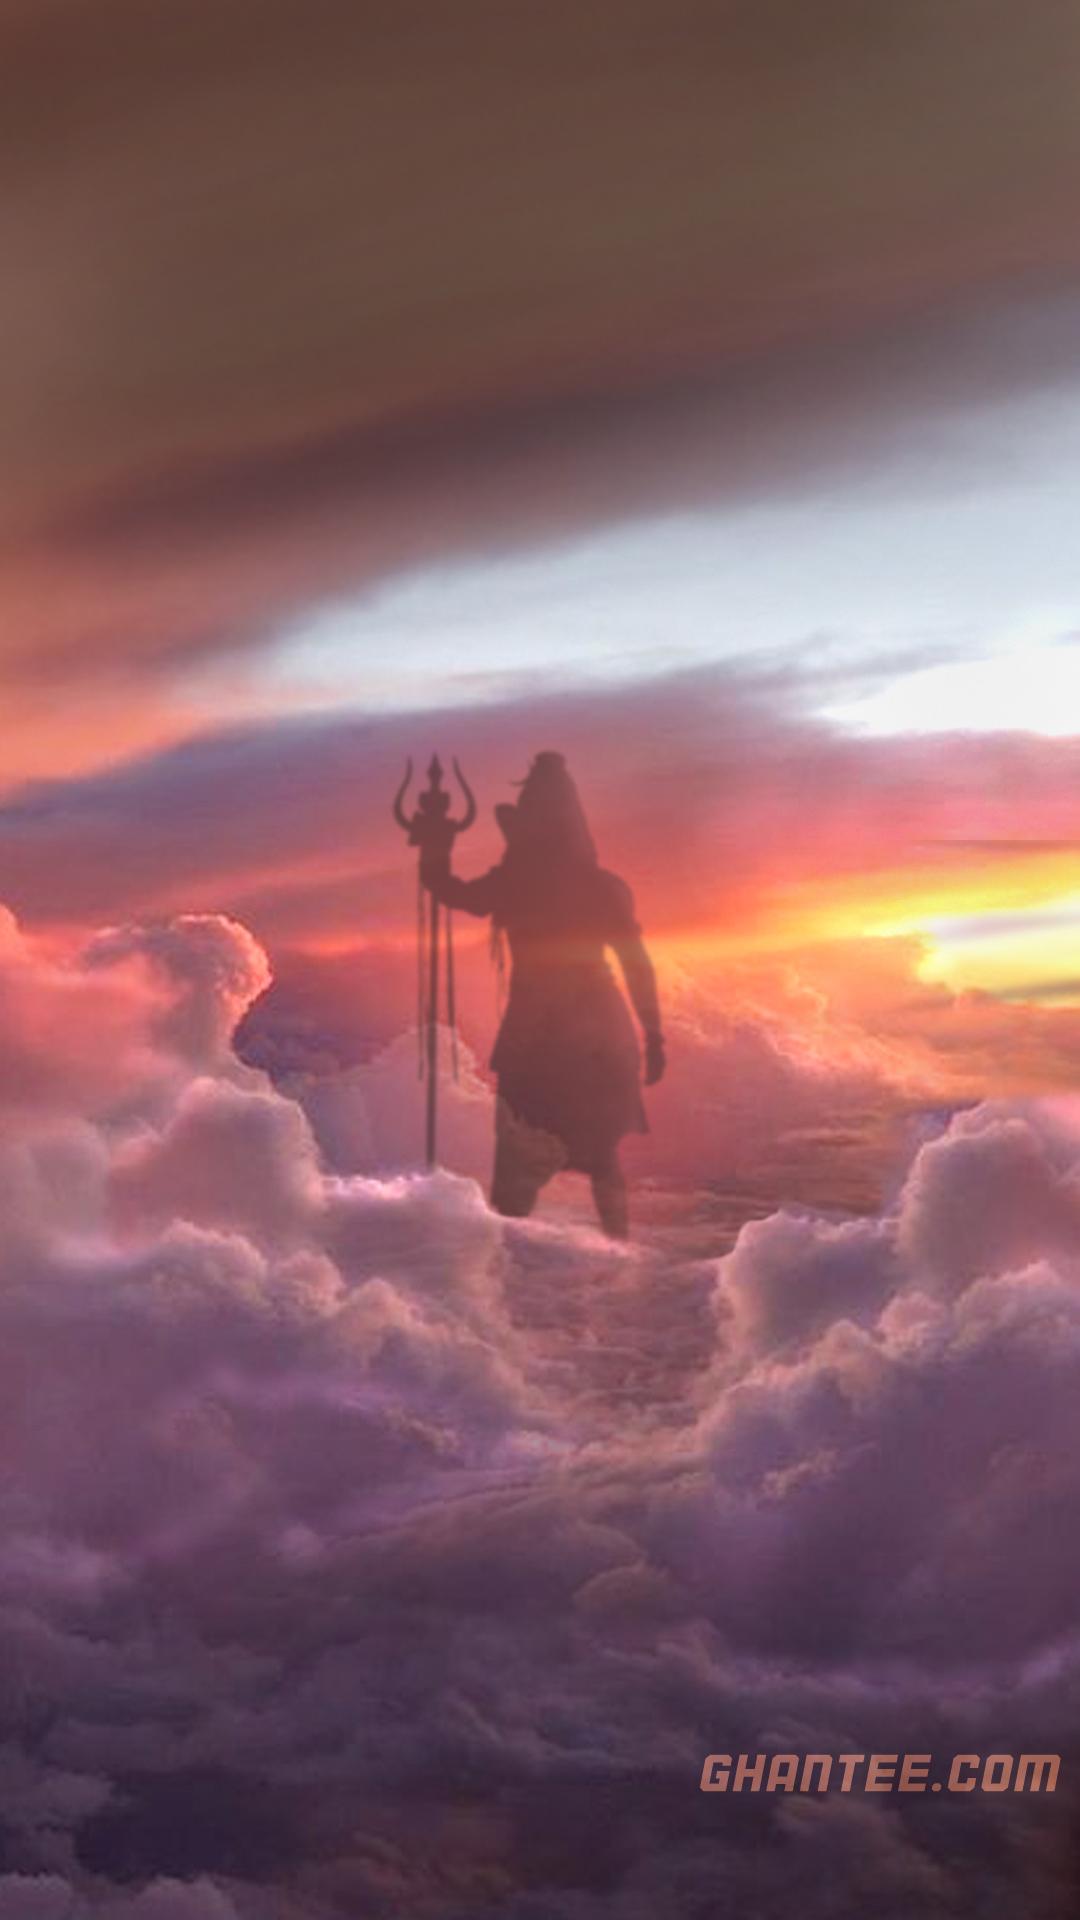 lord shiva in clouds hd lockscreen wallpaper | 1080×1920